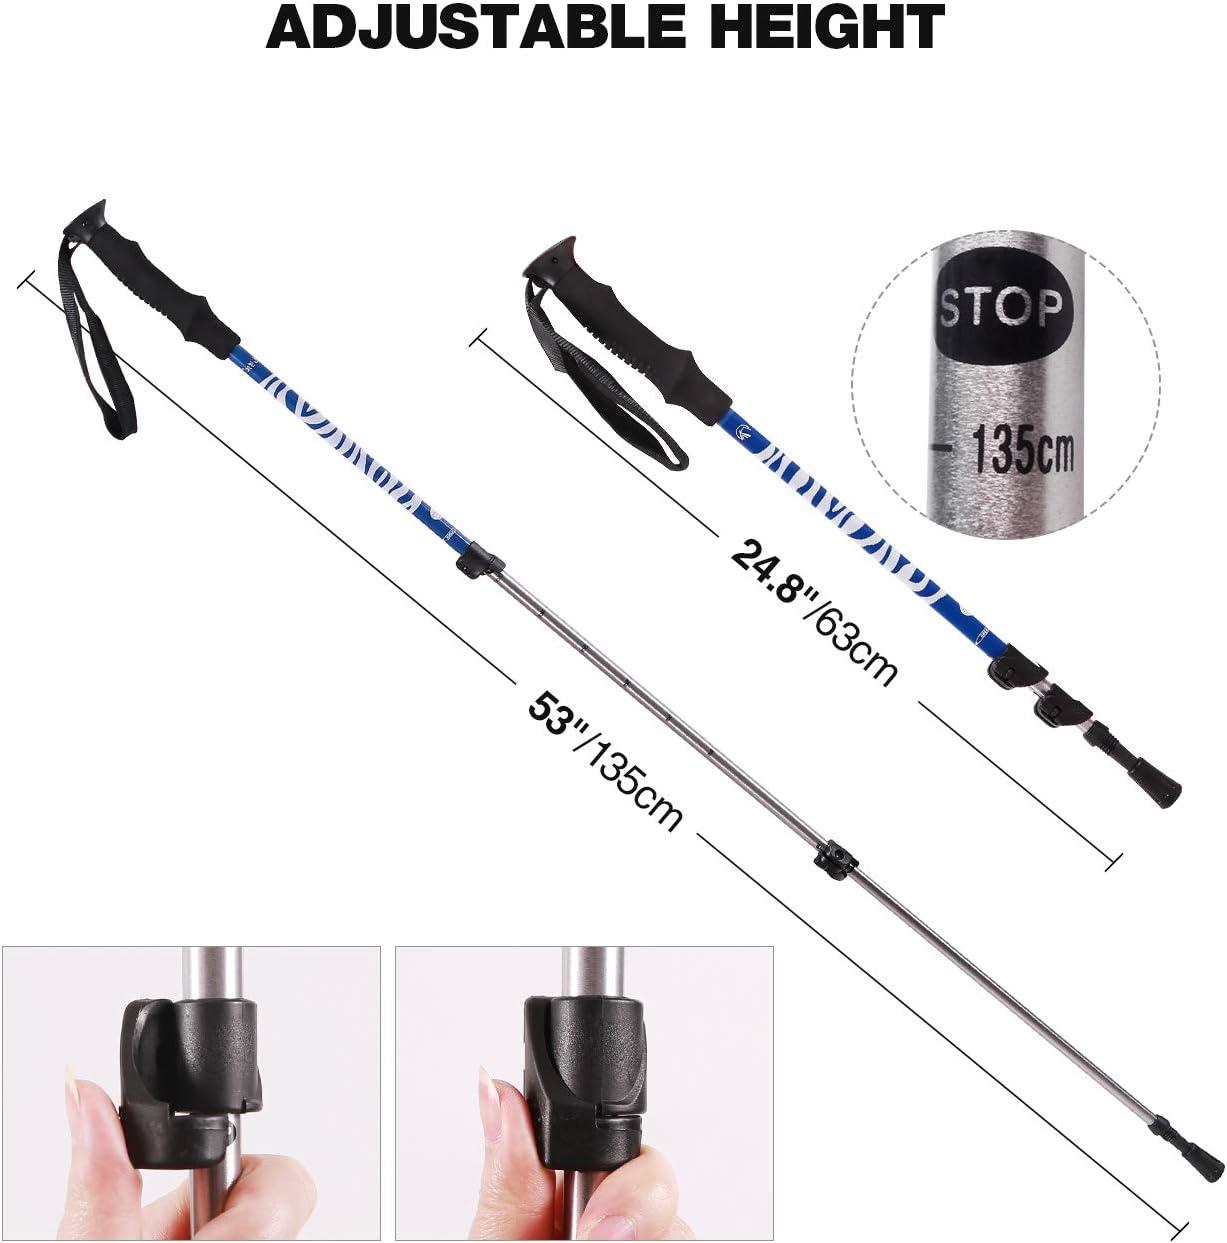 REDCAMP Aluminum Trekking Poles Collapsible 2-Pack Walking Sticks for Hiking